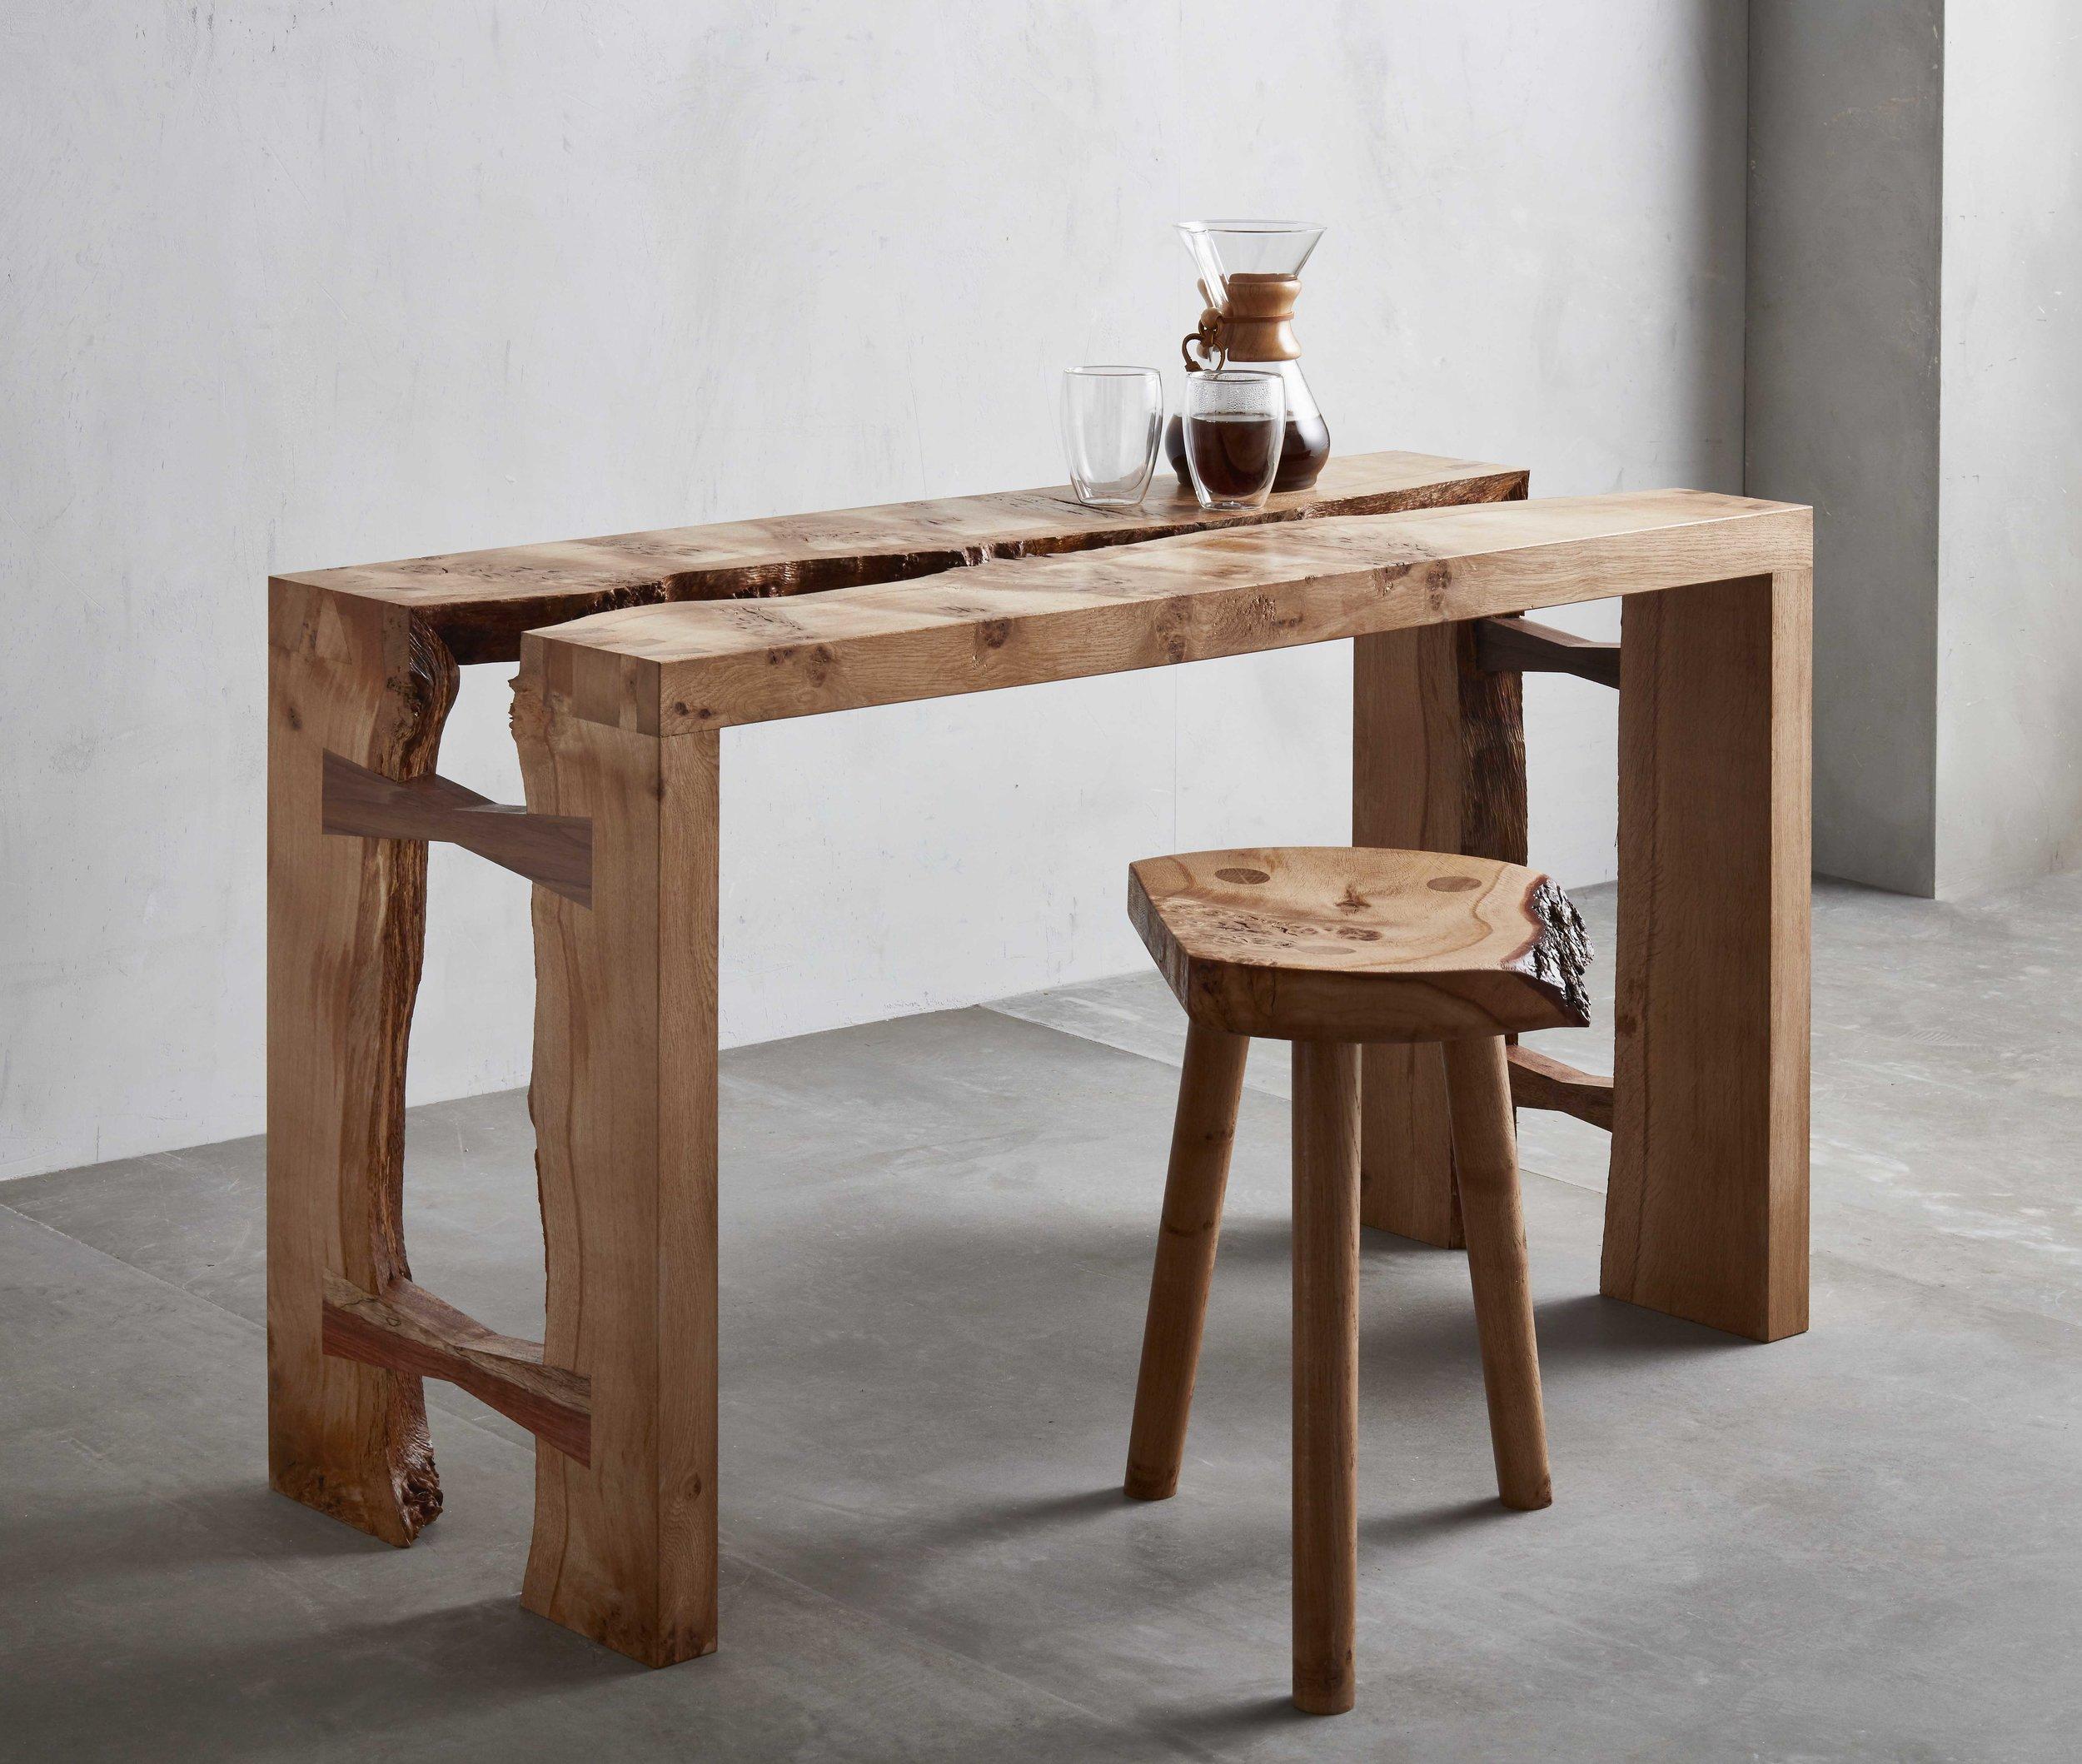 Takumi Woodwork - Oak Workstation and Stool